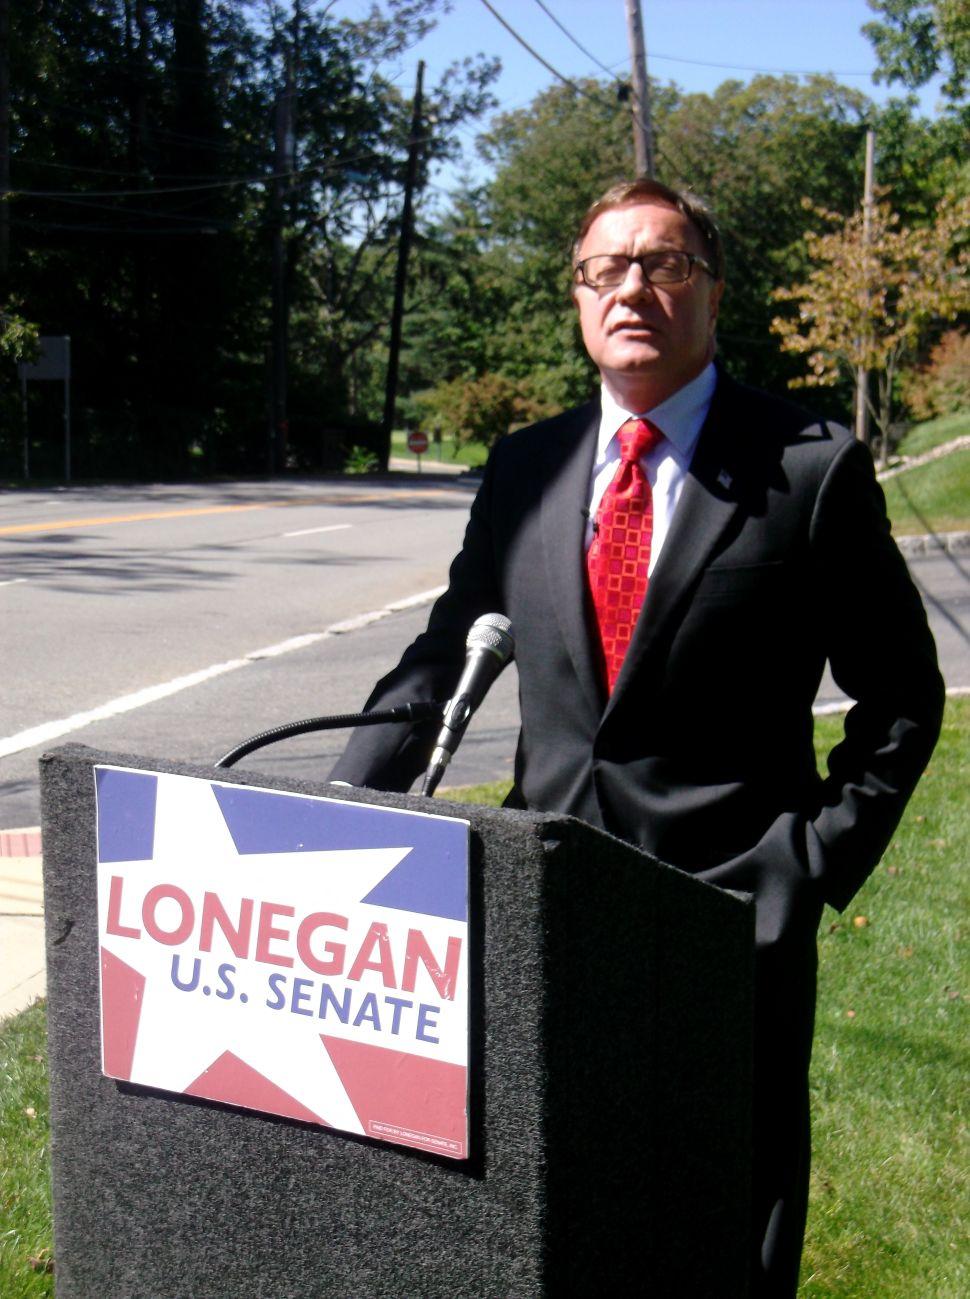 DNC criticizes Christie over Lonegan fundraiser